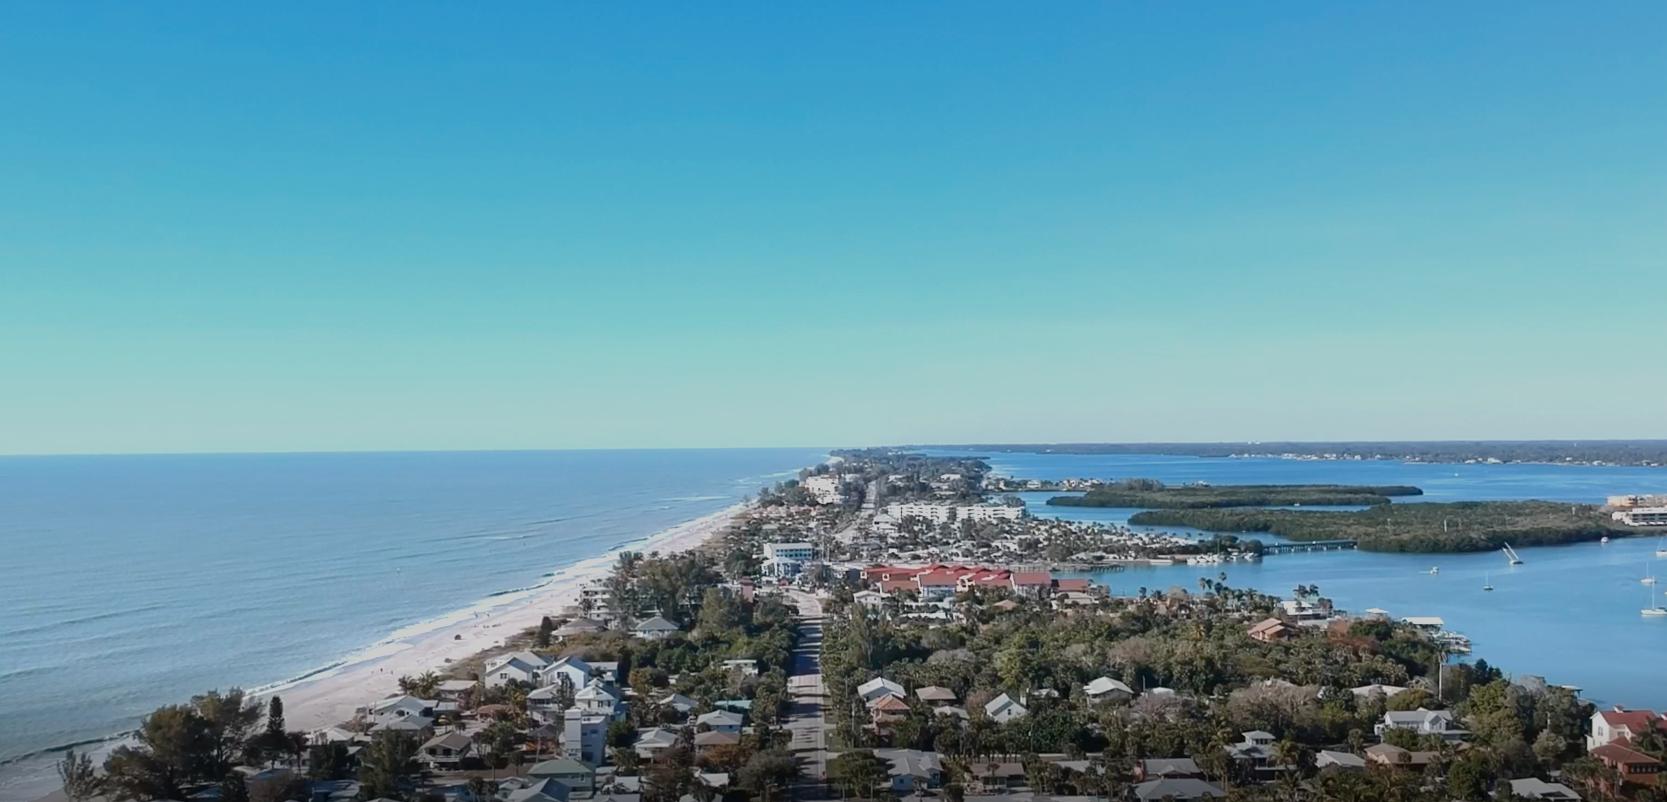 BEACH SHACK OF MANASOTA KEY in Englewood, Florida - Home